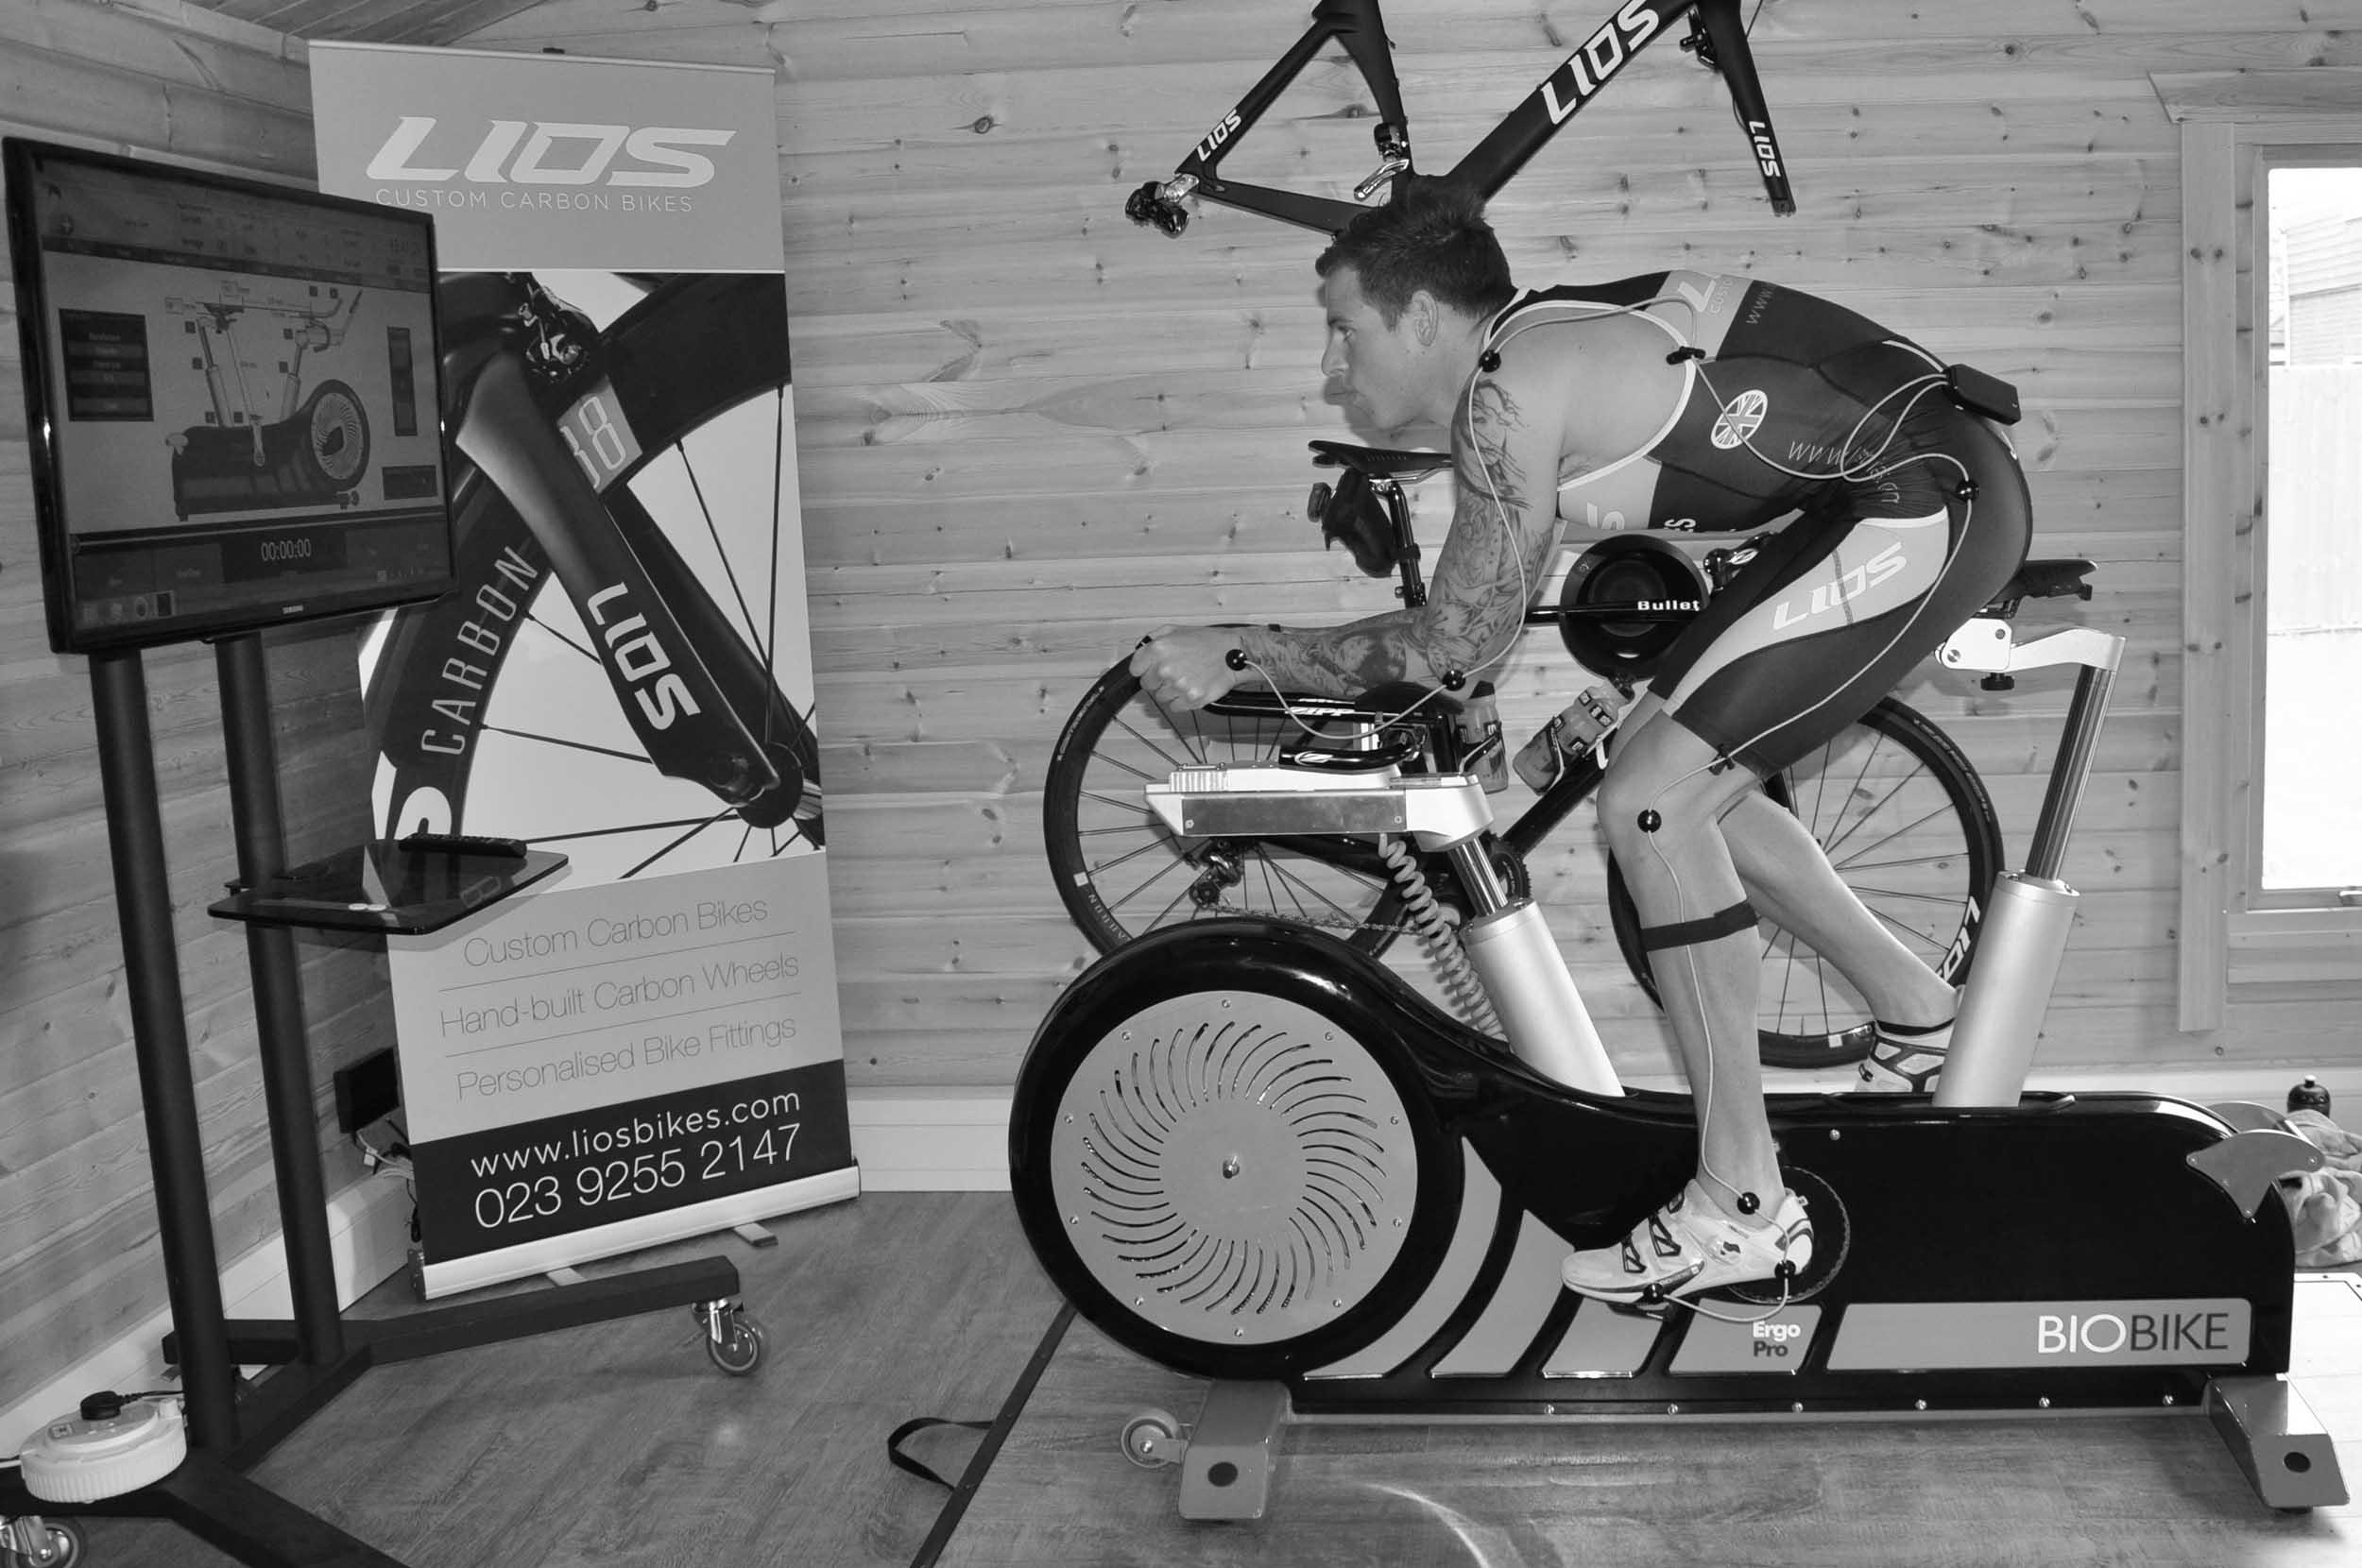 lios-bike-fitting-image-1.jpg